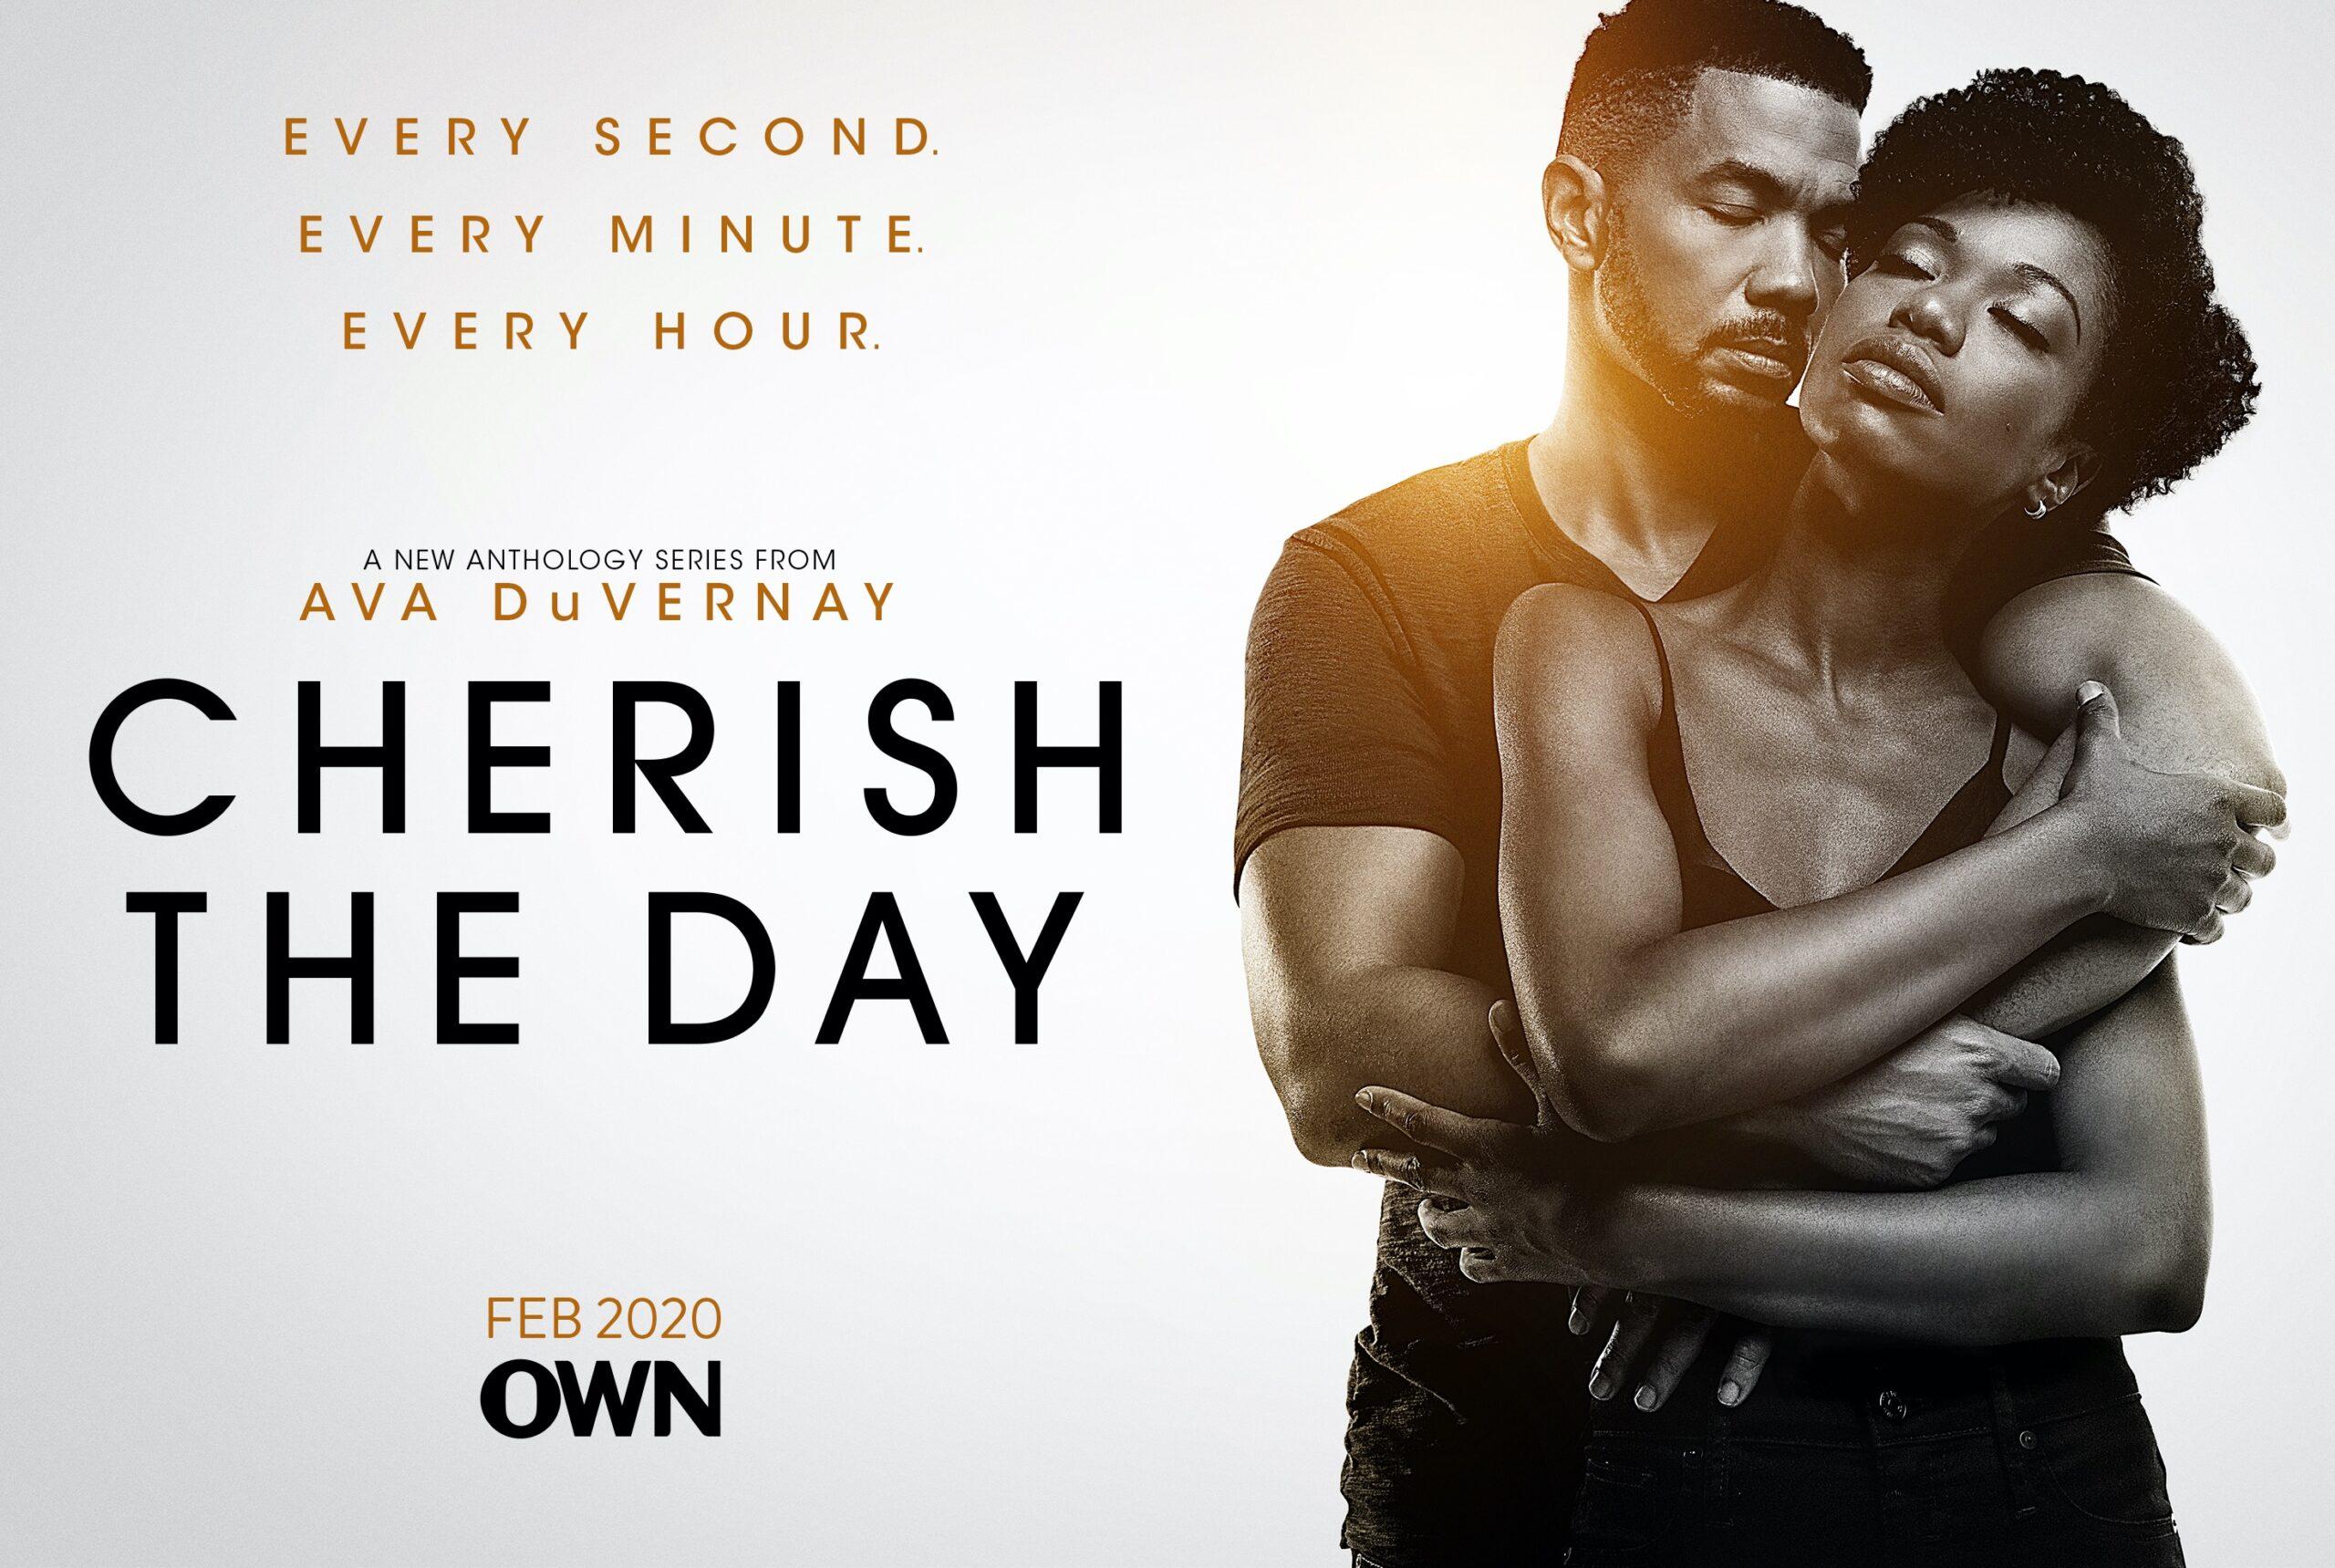 Own Feb 2020 Ave Duvenay